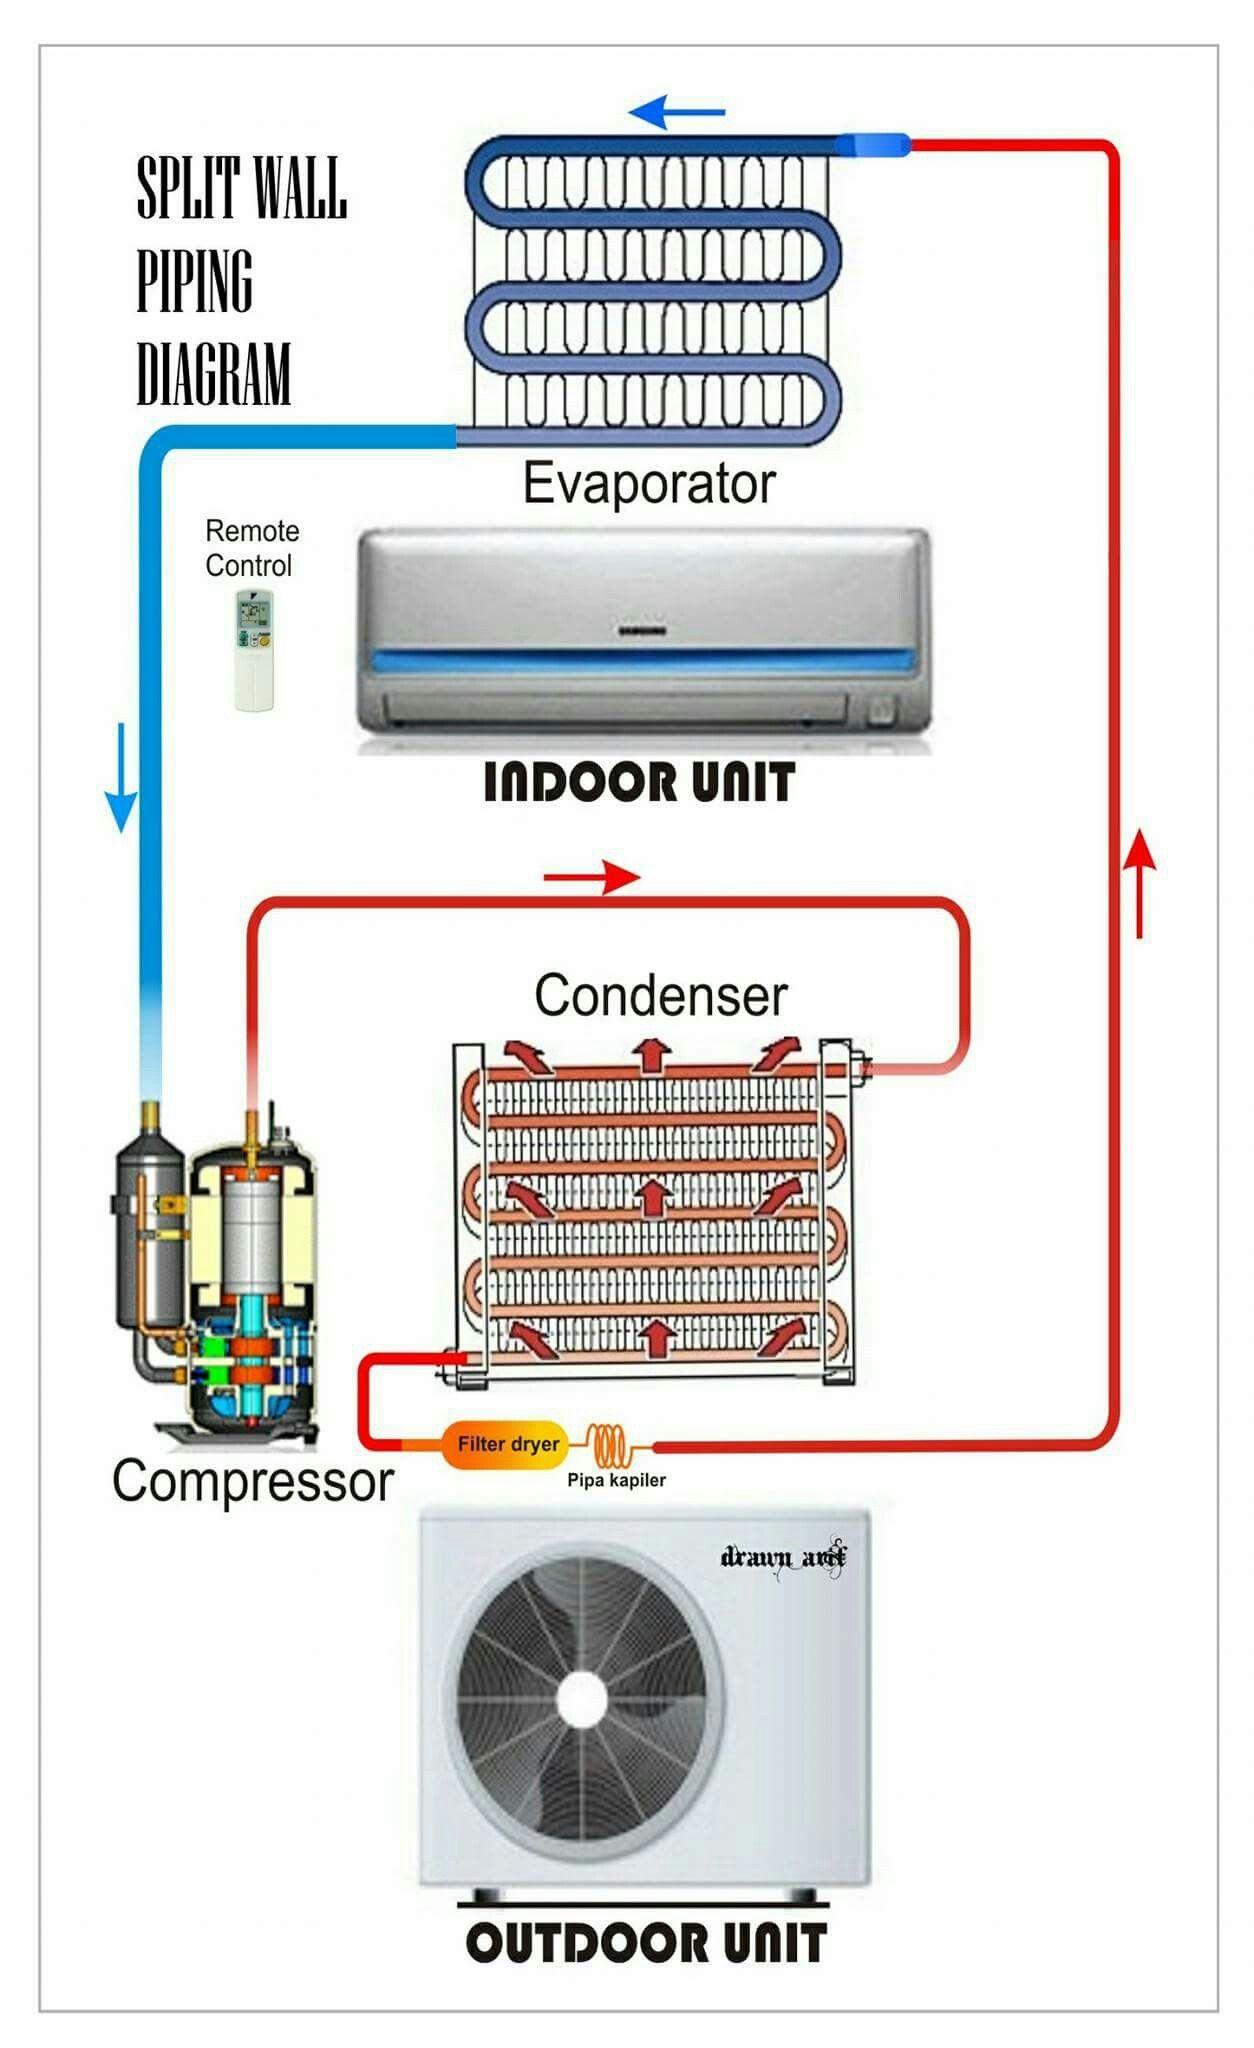 a a split 2 engineering boards electrical engineering electrical wiring mechanical engineering refrigeration [ 1254 x 2048 Pixel ]